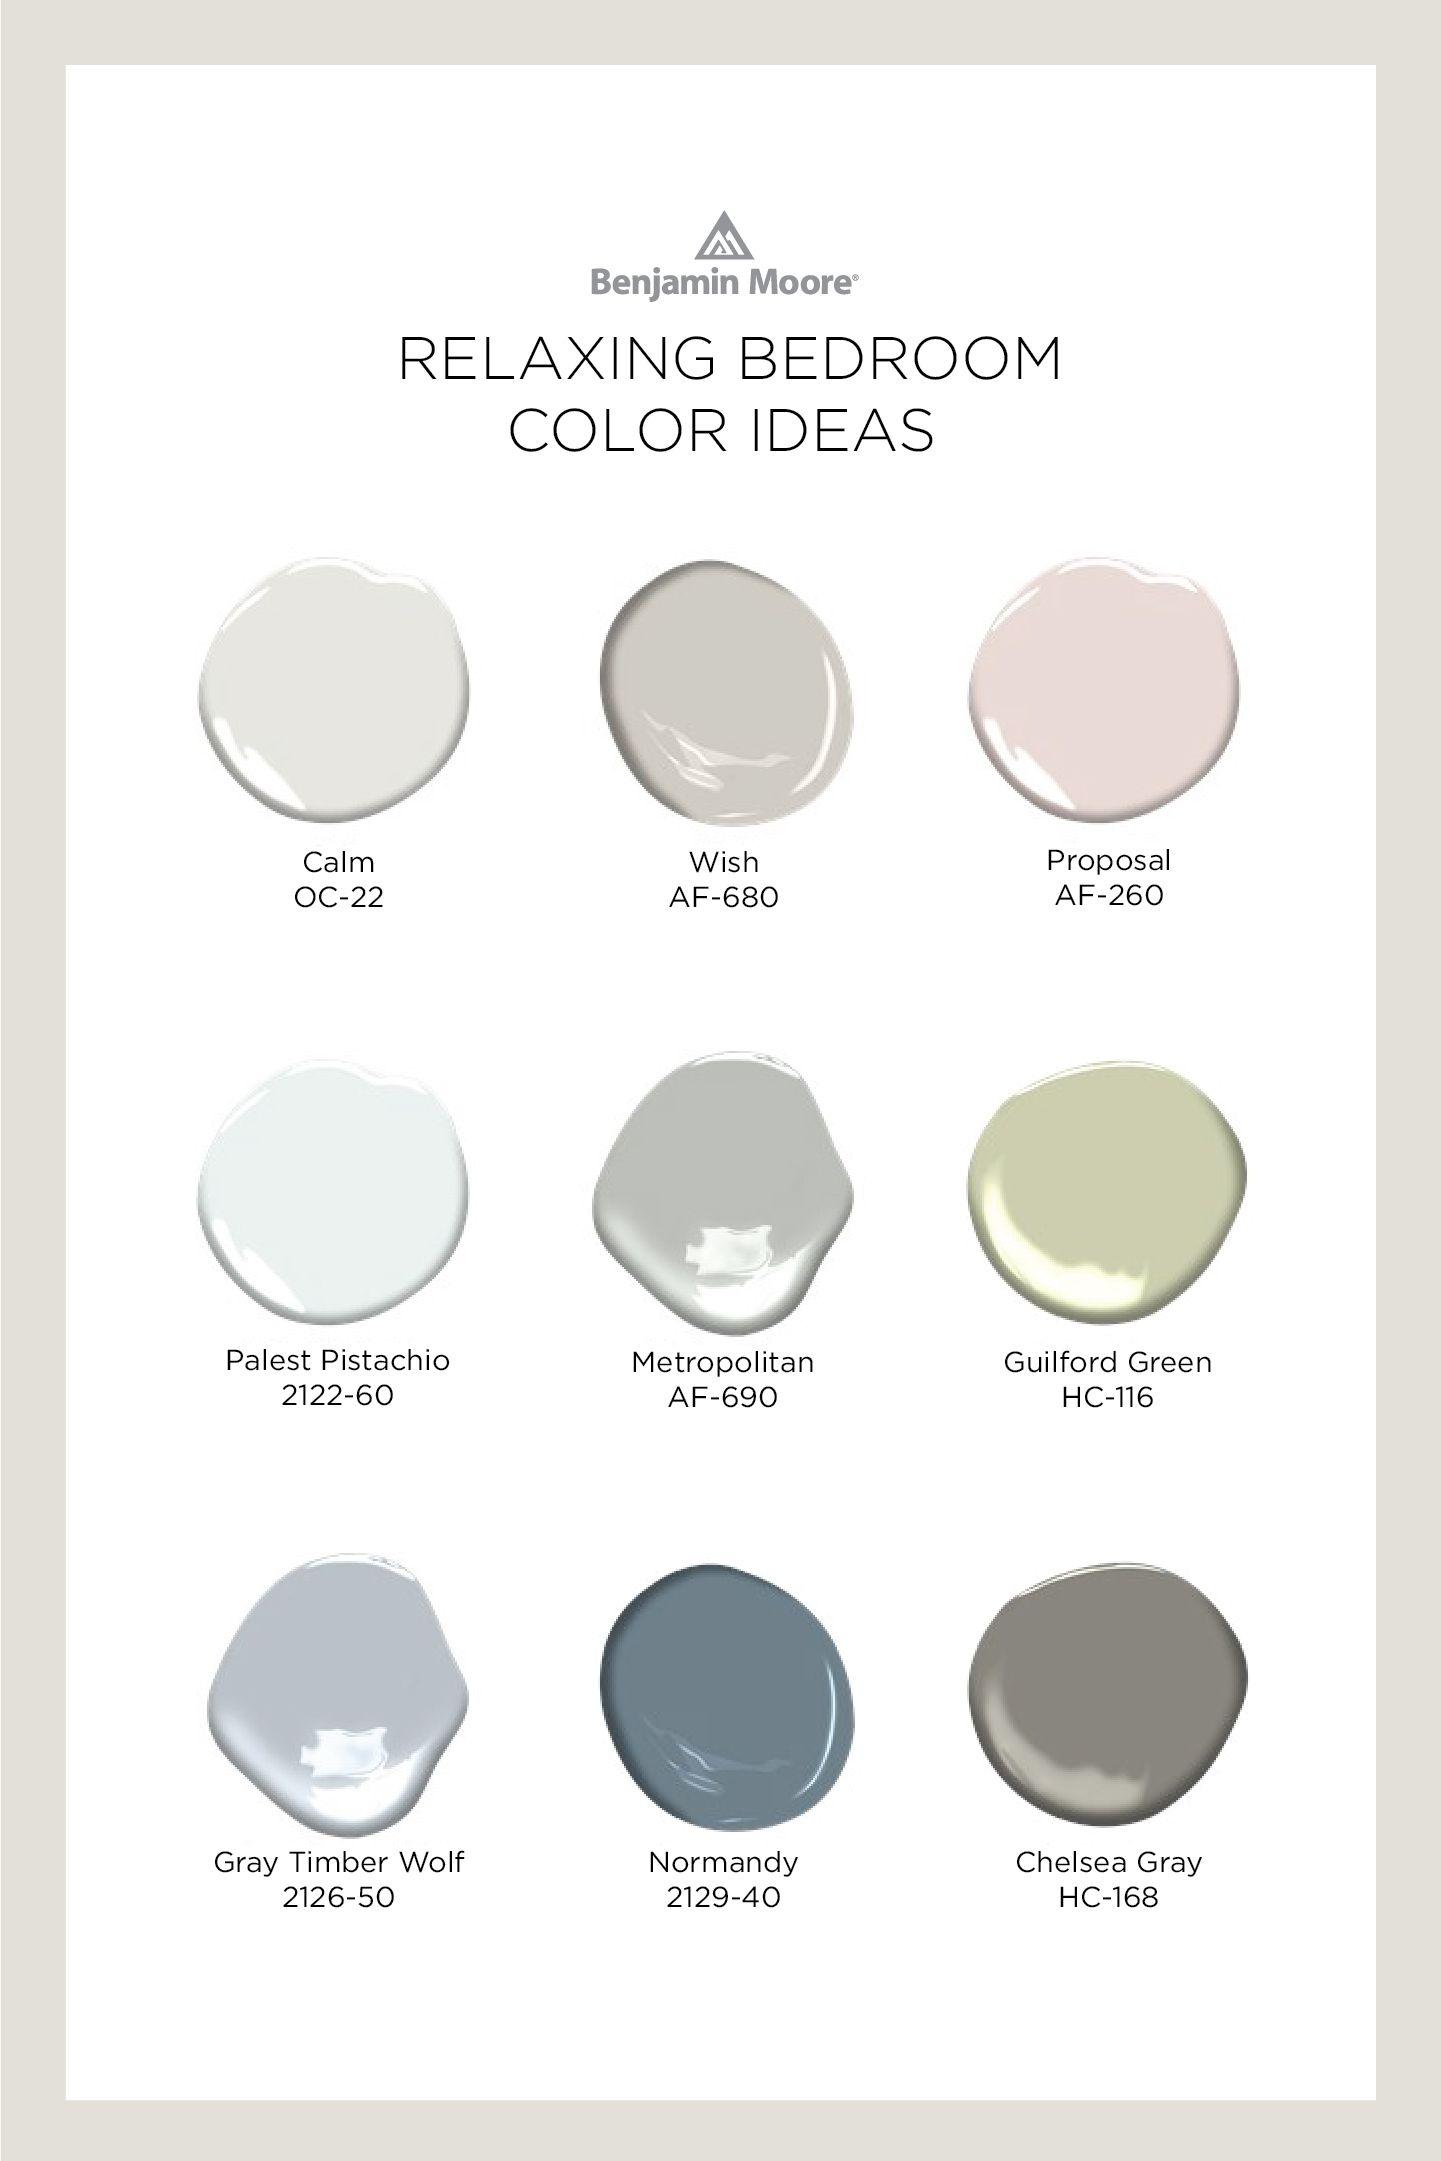 Bedroom Color Ideas Inspiration Benjamin Moore In 2020 Relaxing Bedroom Colors Small Room Paint Color Benjamin Moore Colors